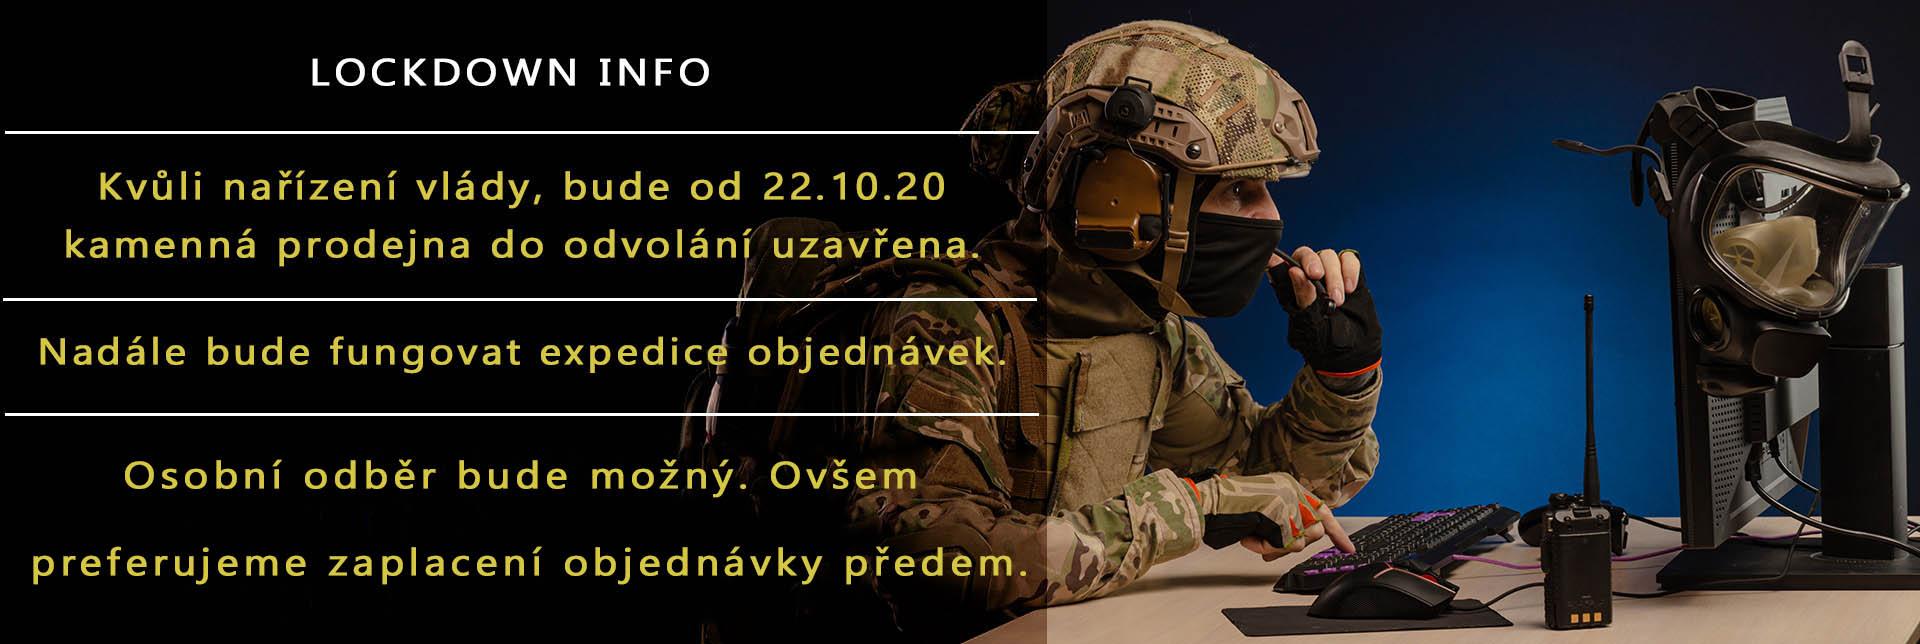 lockdown_info_cz